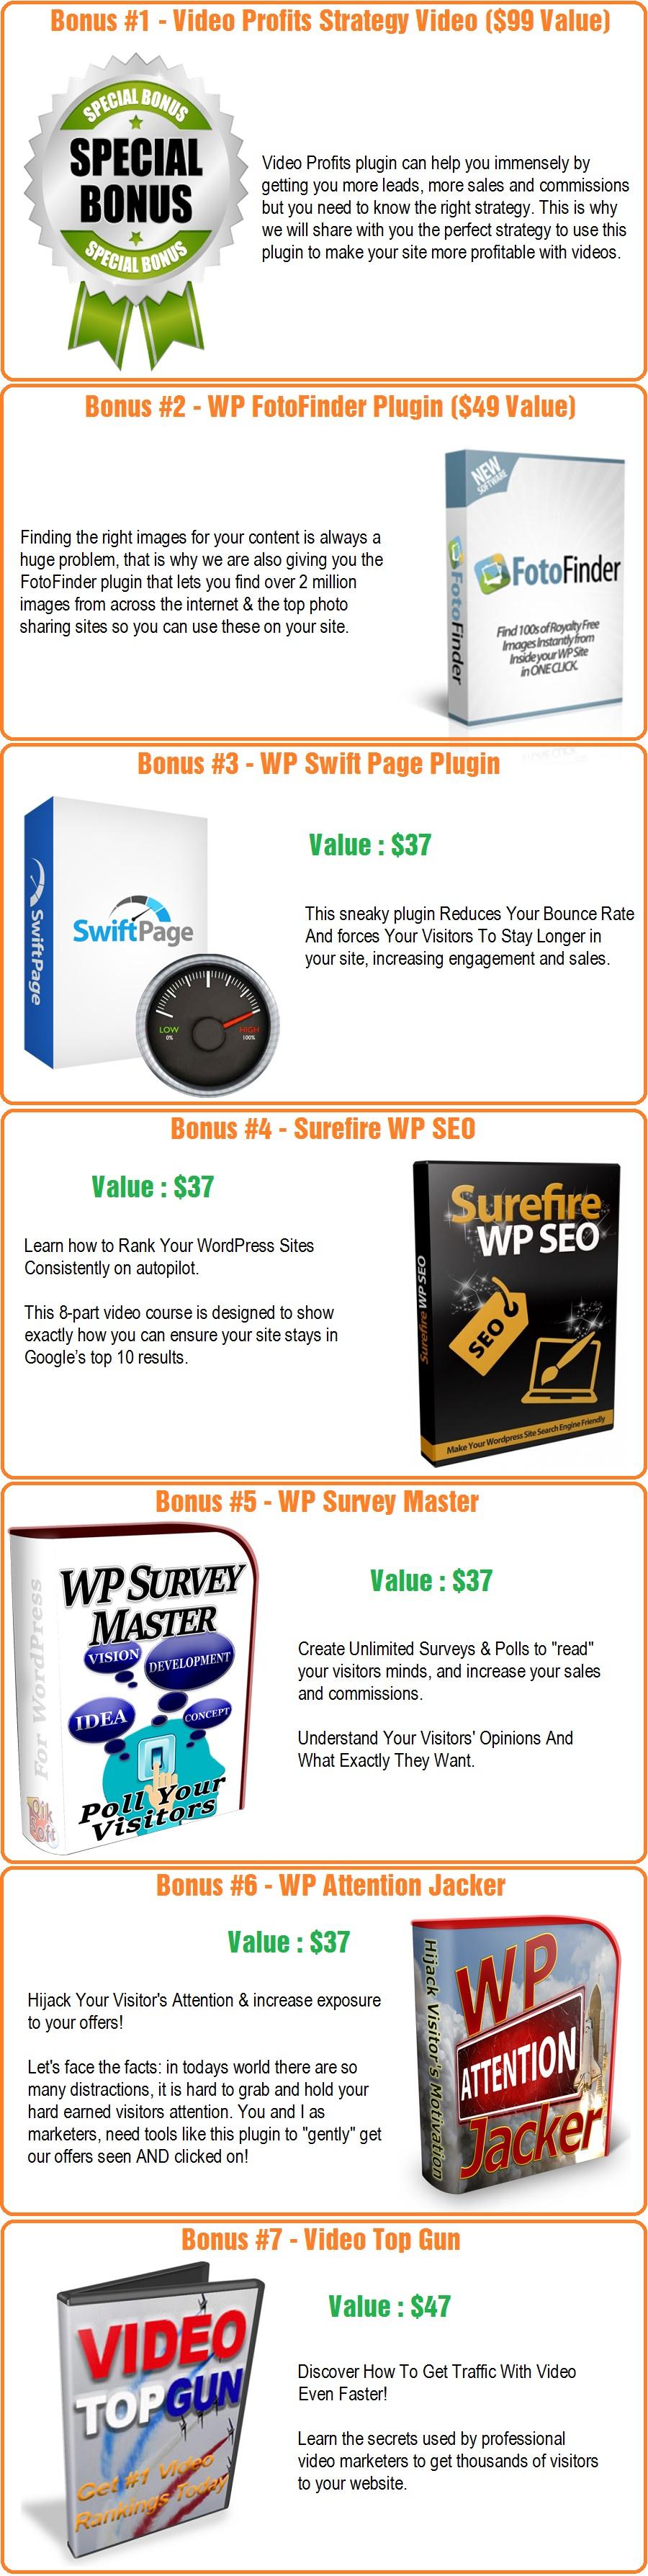 WP Video Profits Bonus